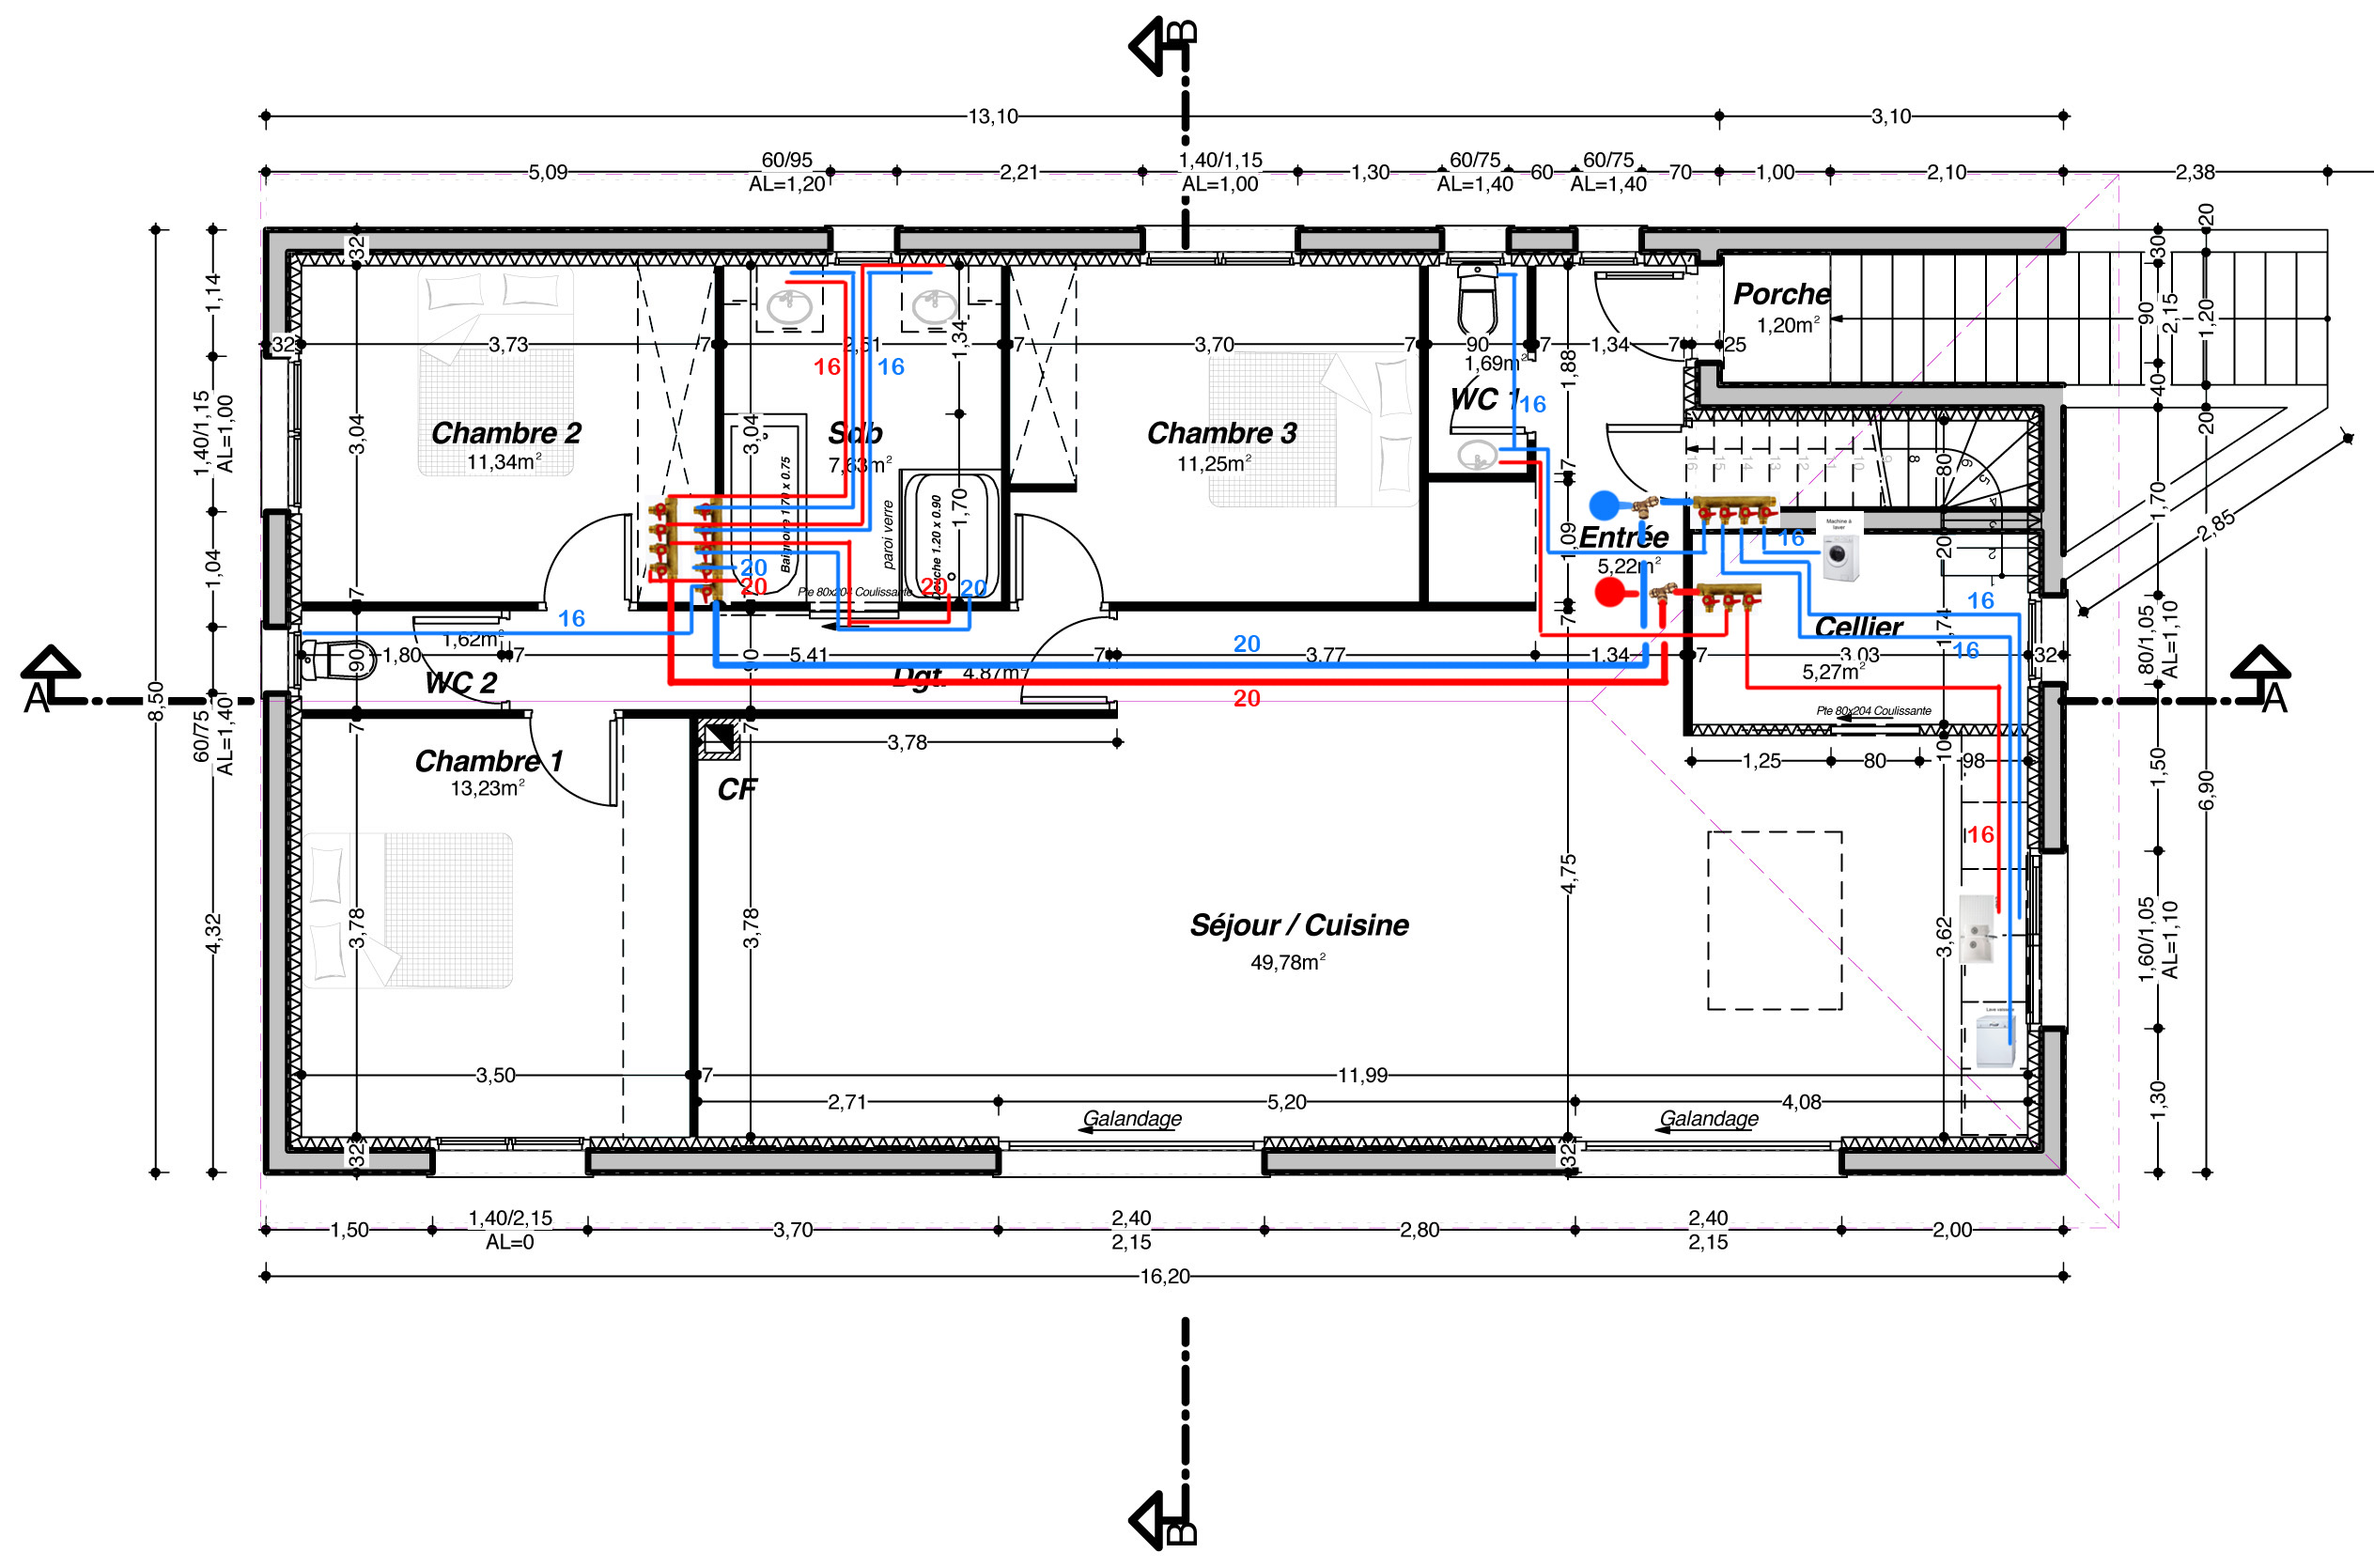 ETAGE - Plan alim eau.jpg, 542.54 kb, 2527 x 1669